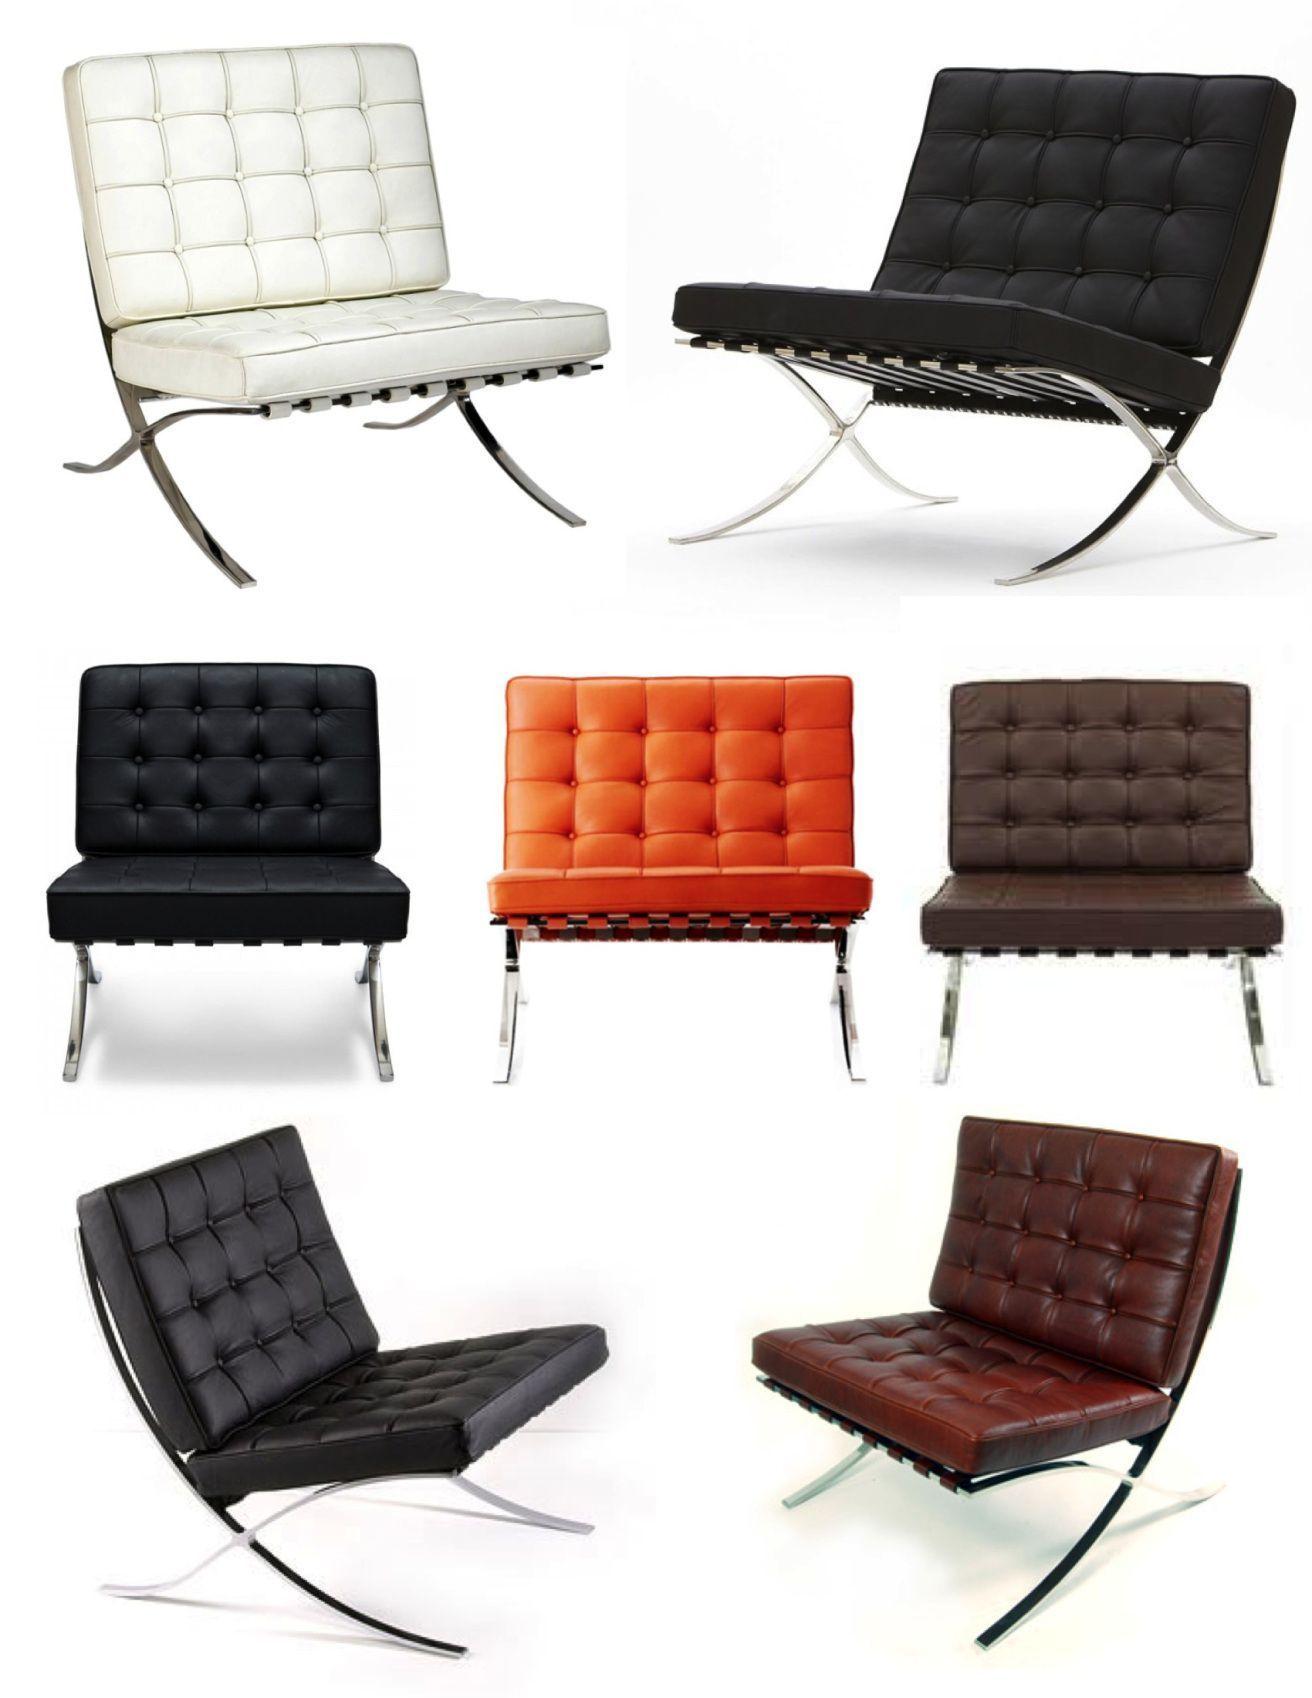 The Barcelona Chair Barcelonachair